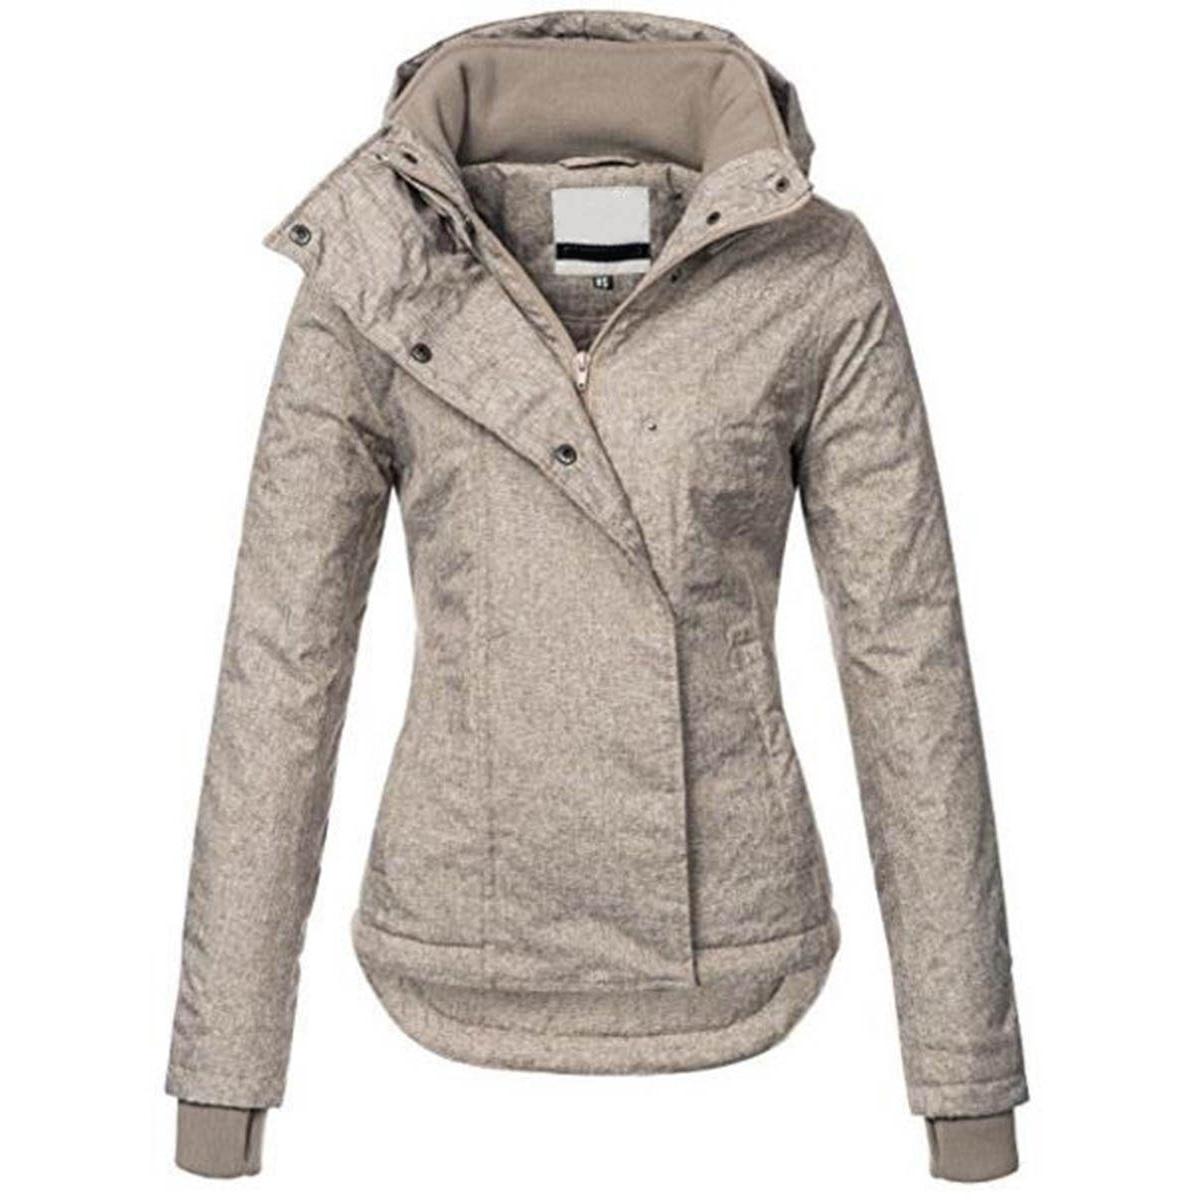 Women Casual Basic Outwear Jacket Plus Size Solid Hooded OverCoat Winter Lapel Slim Bomber Jacket Warm Thick Top Street Jacket